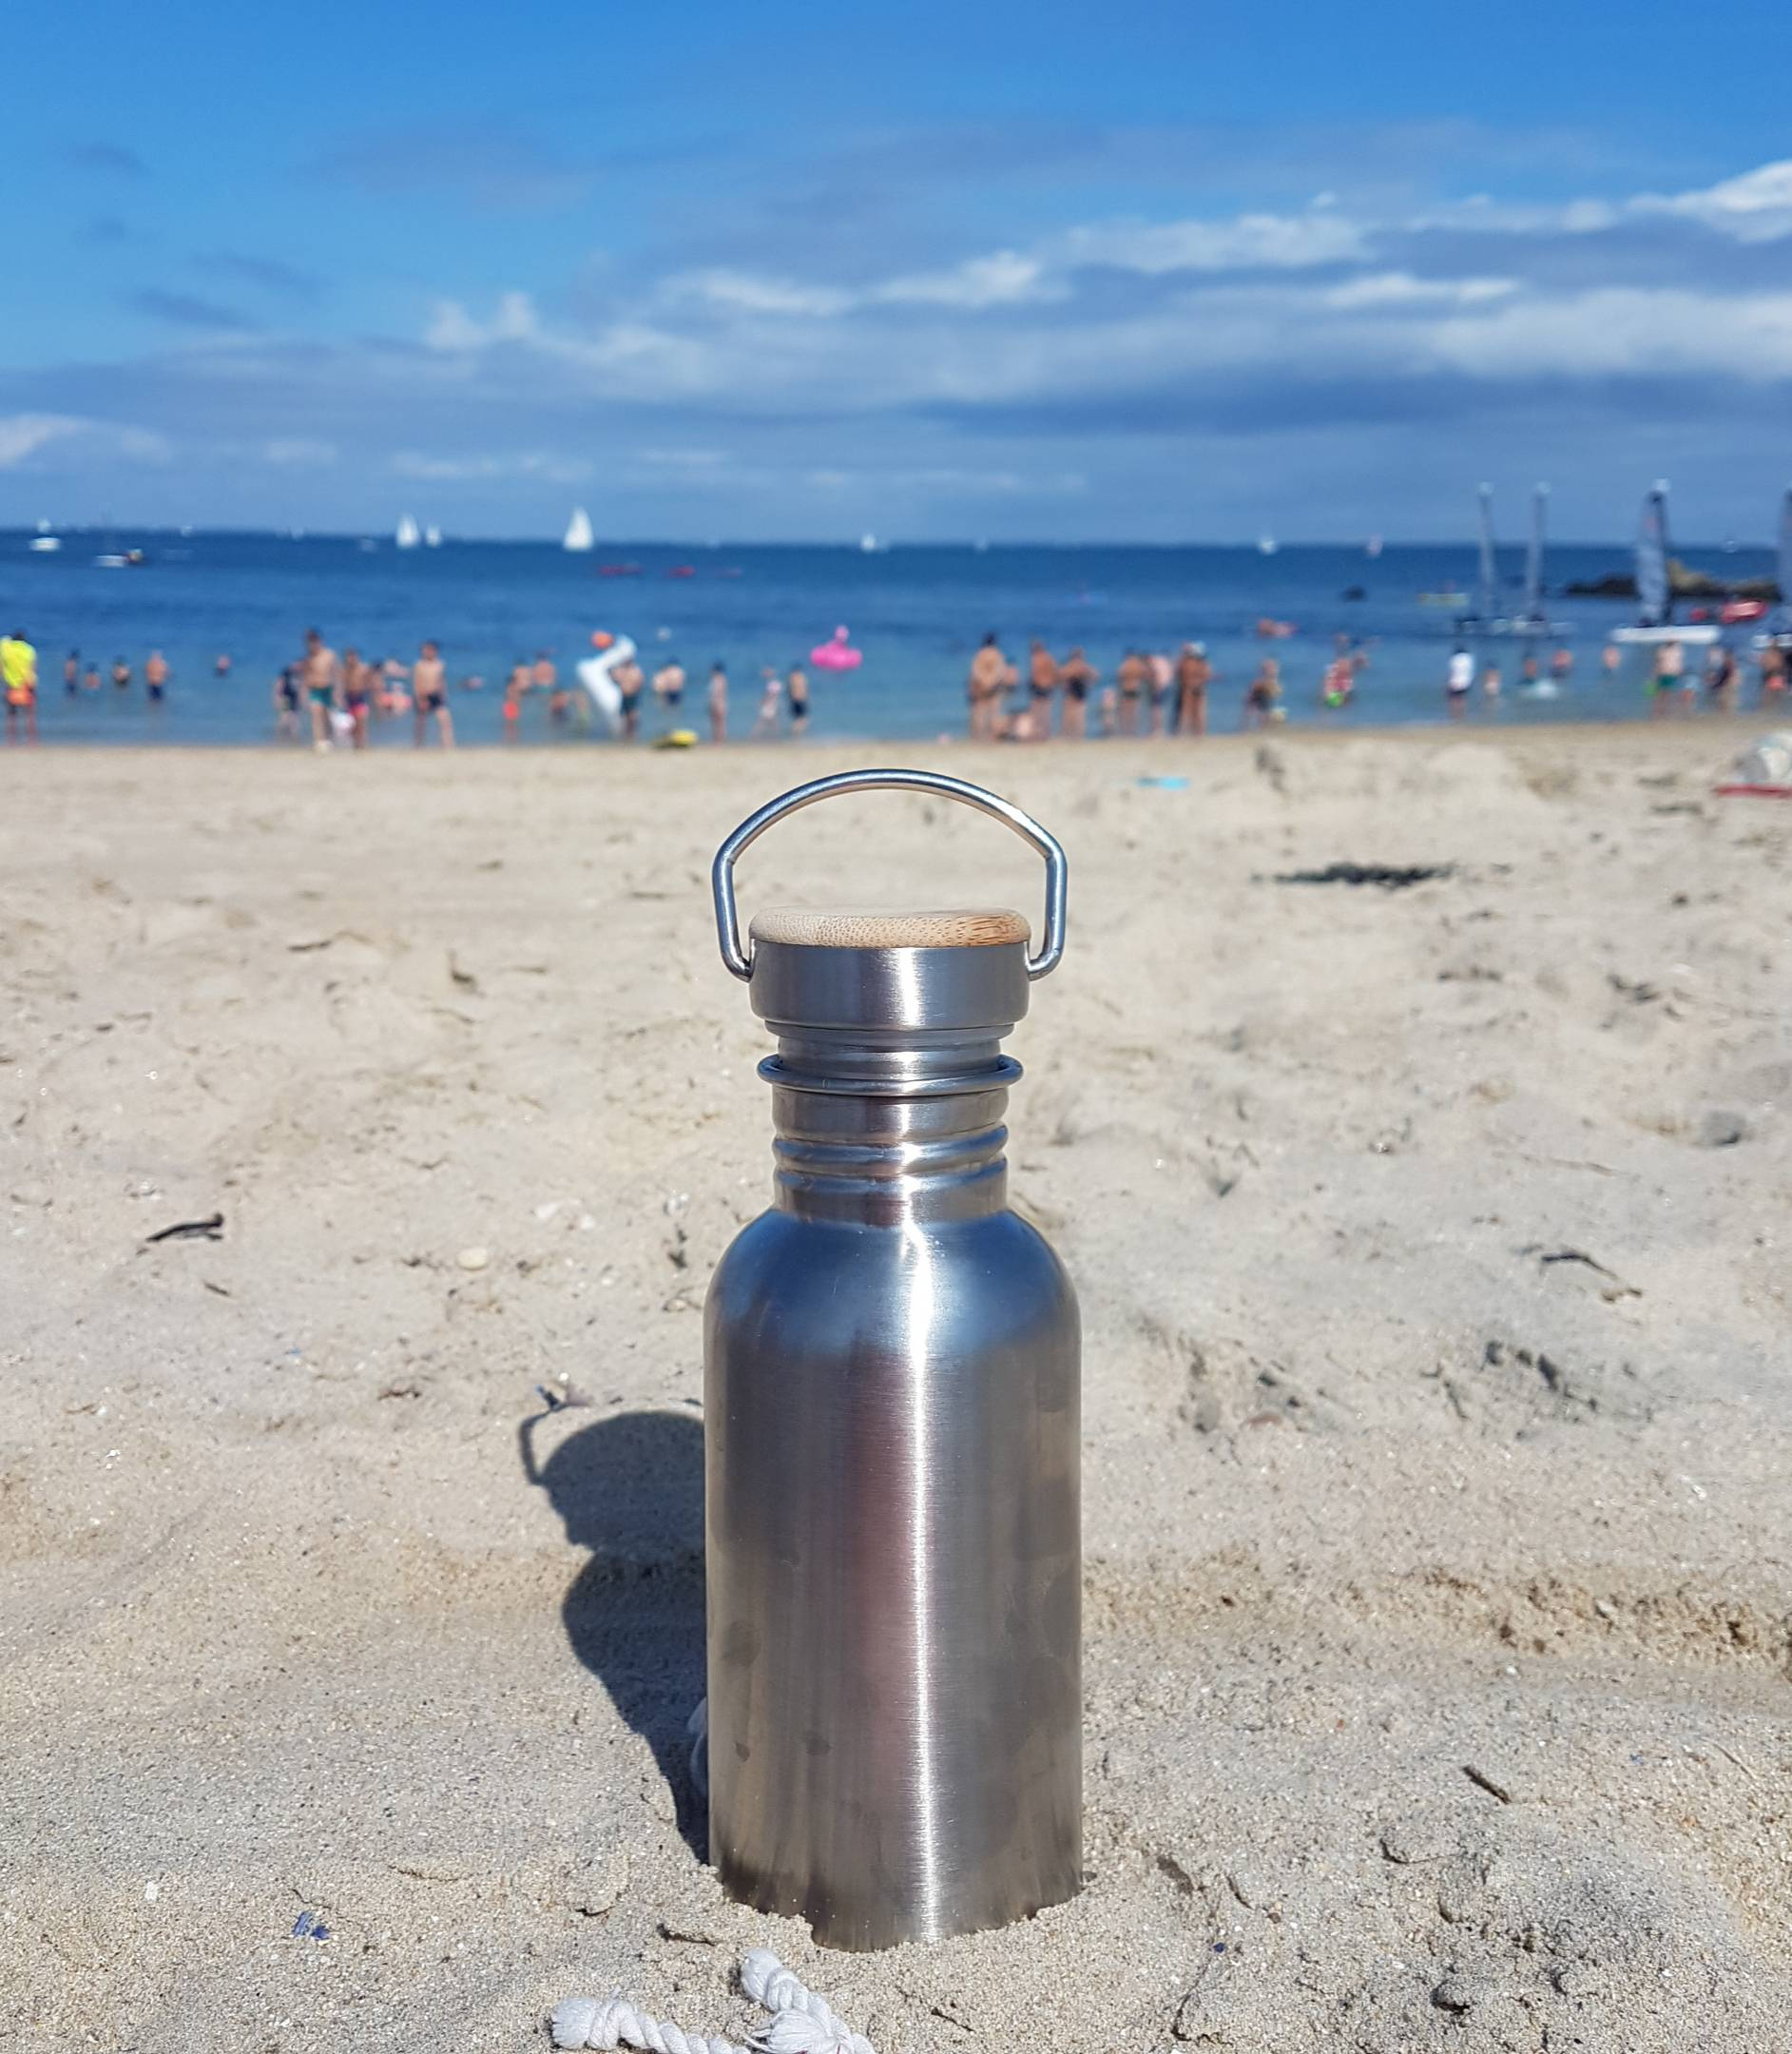 bouteille-acier-inoxydable-transport-sport-camping-ecologique